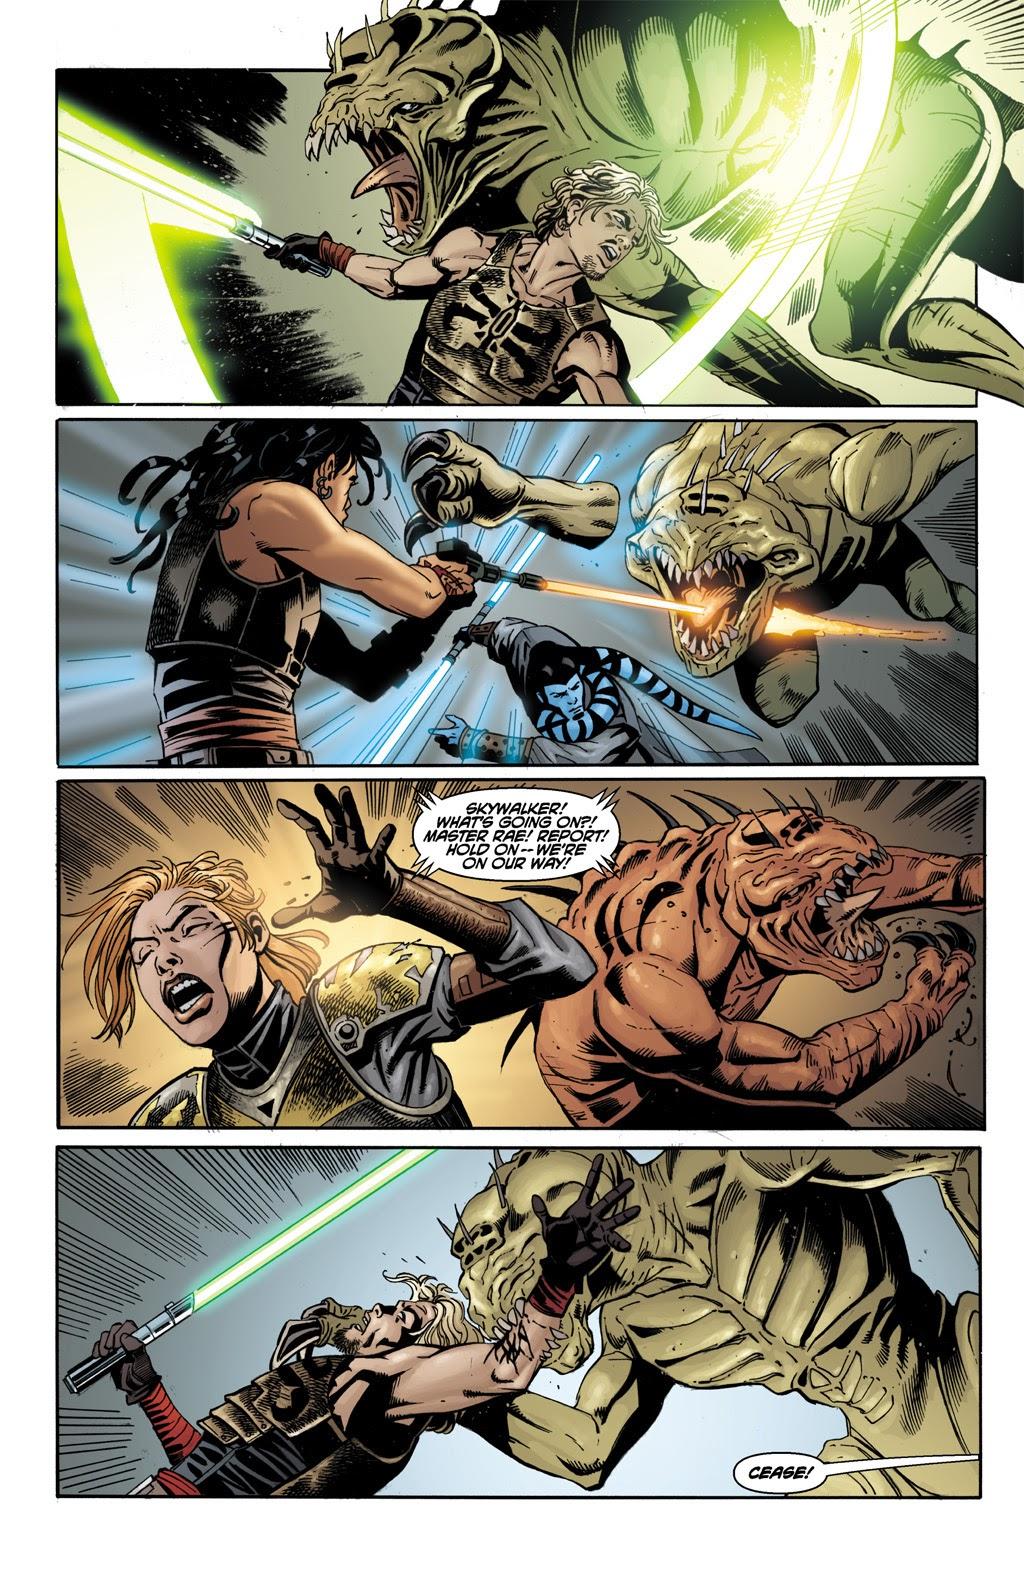 Cade Skywalker VS Rakghouls